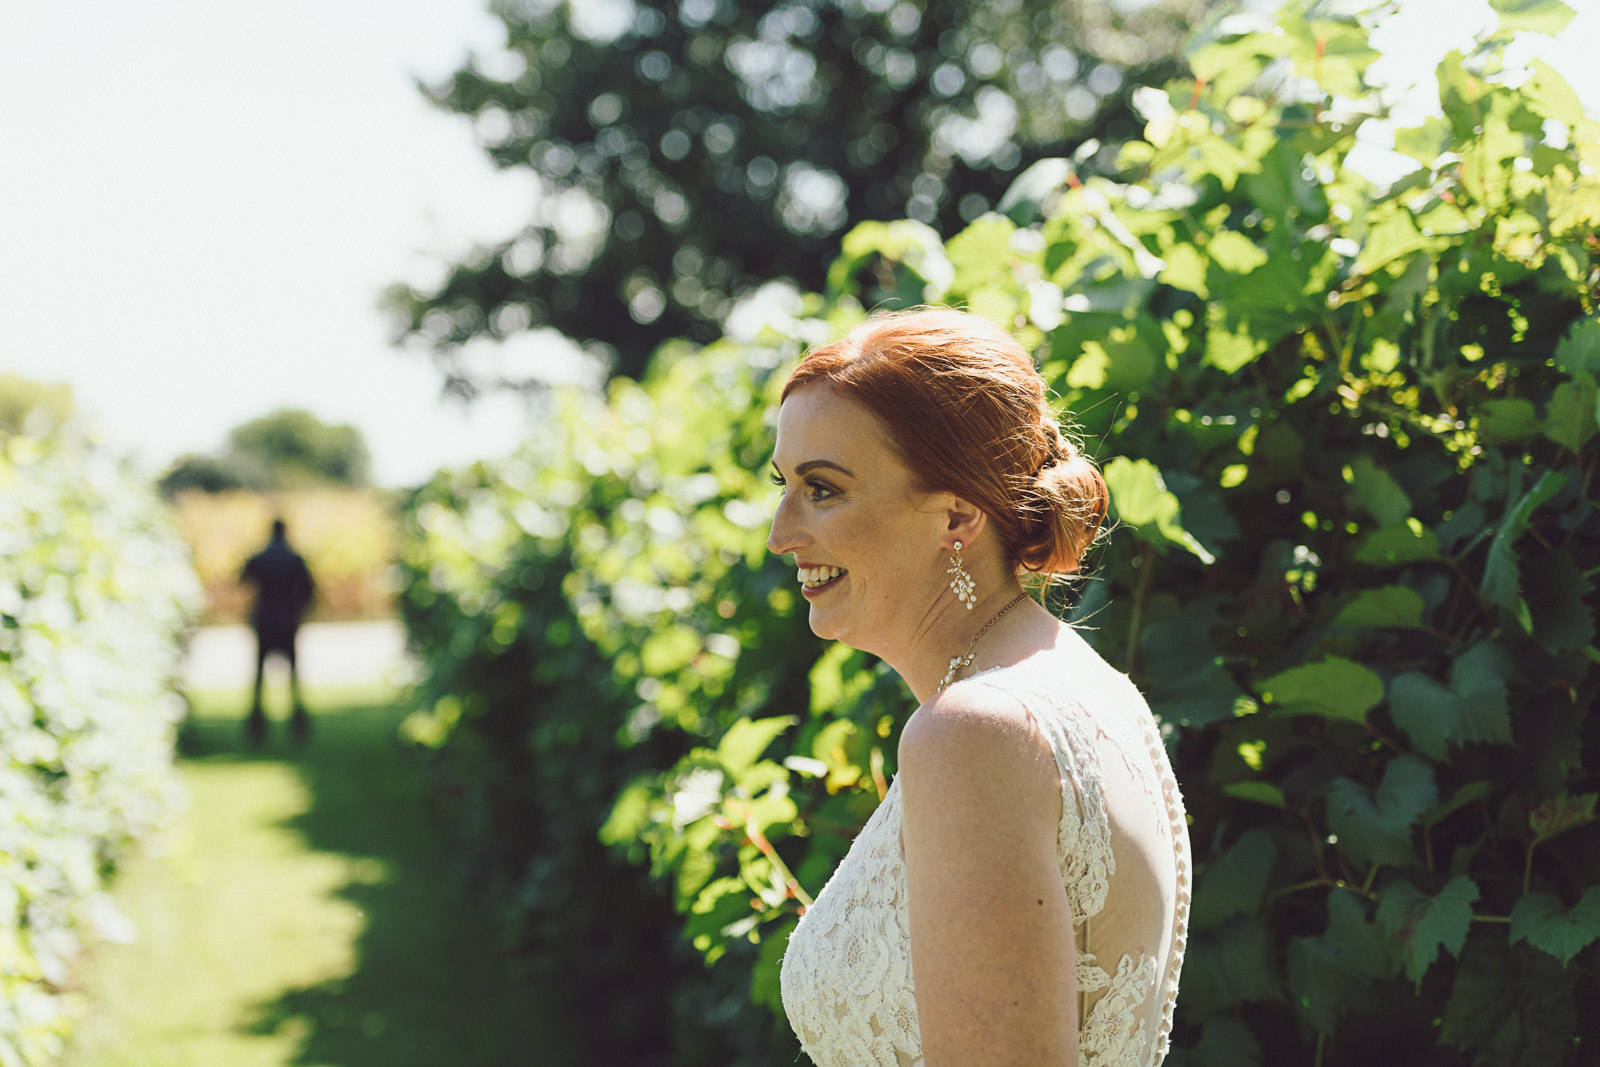 wedding-keely-caleb-128-name-your-photo.jpg